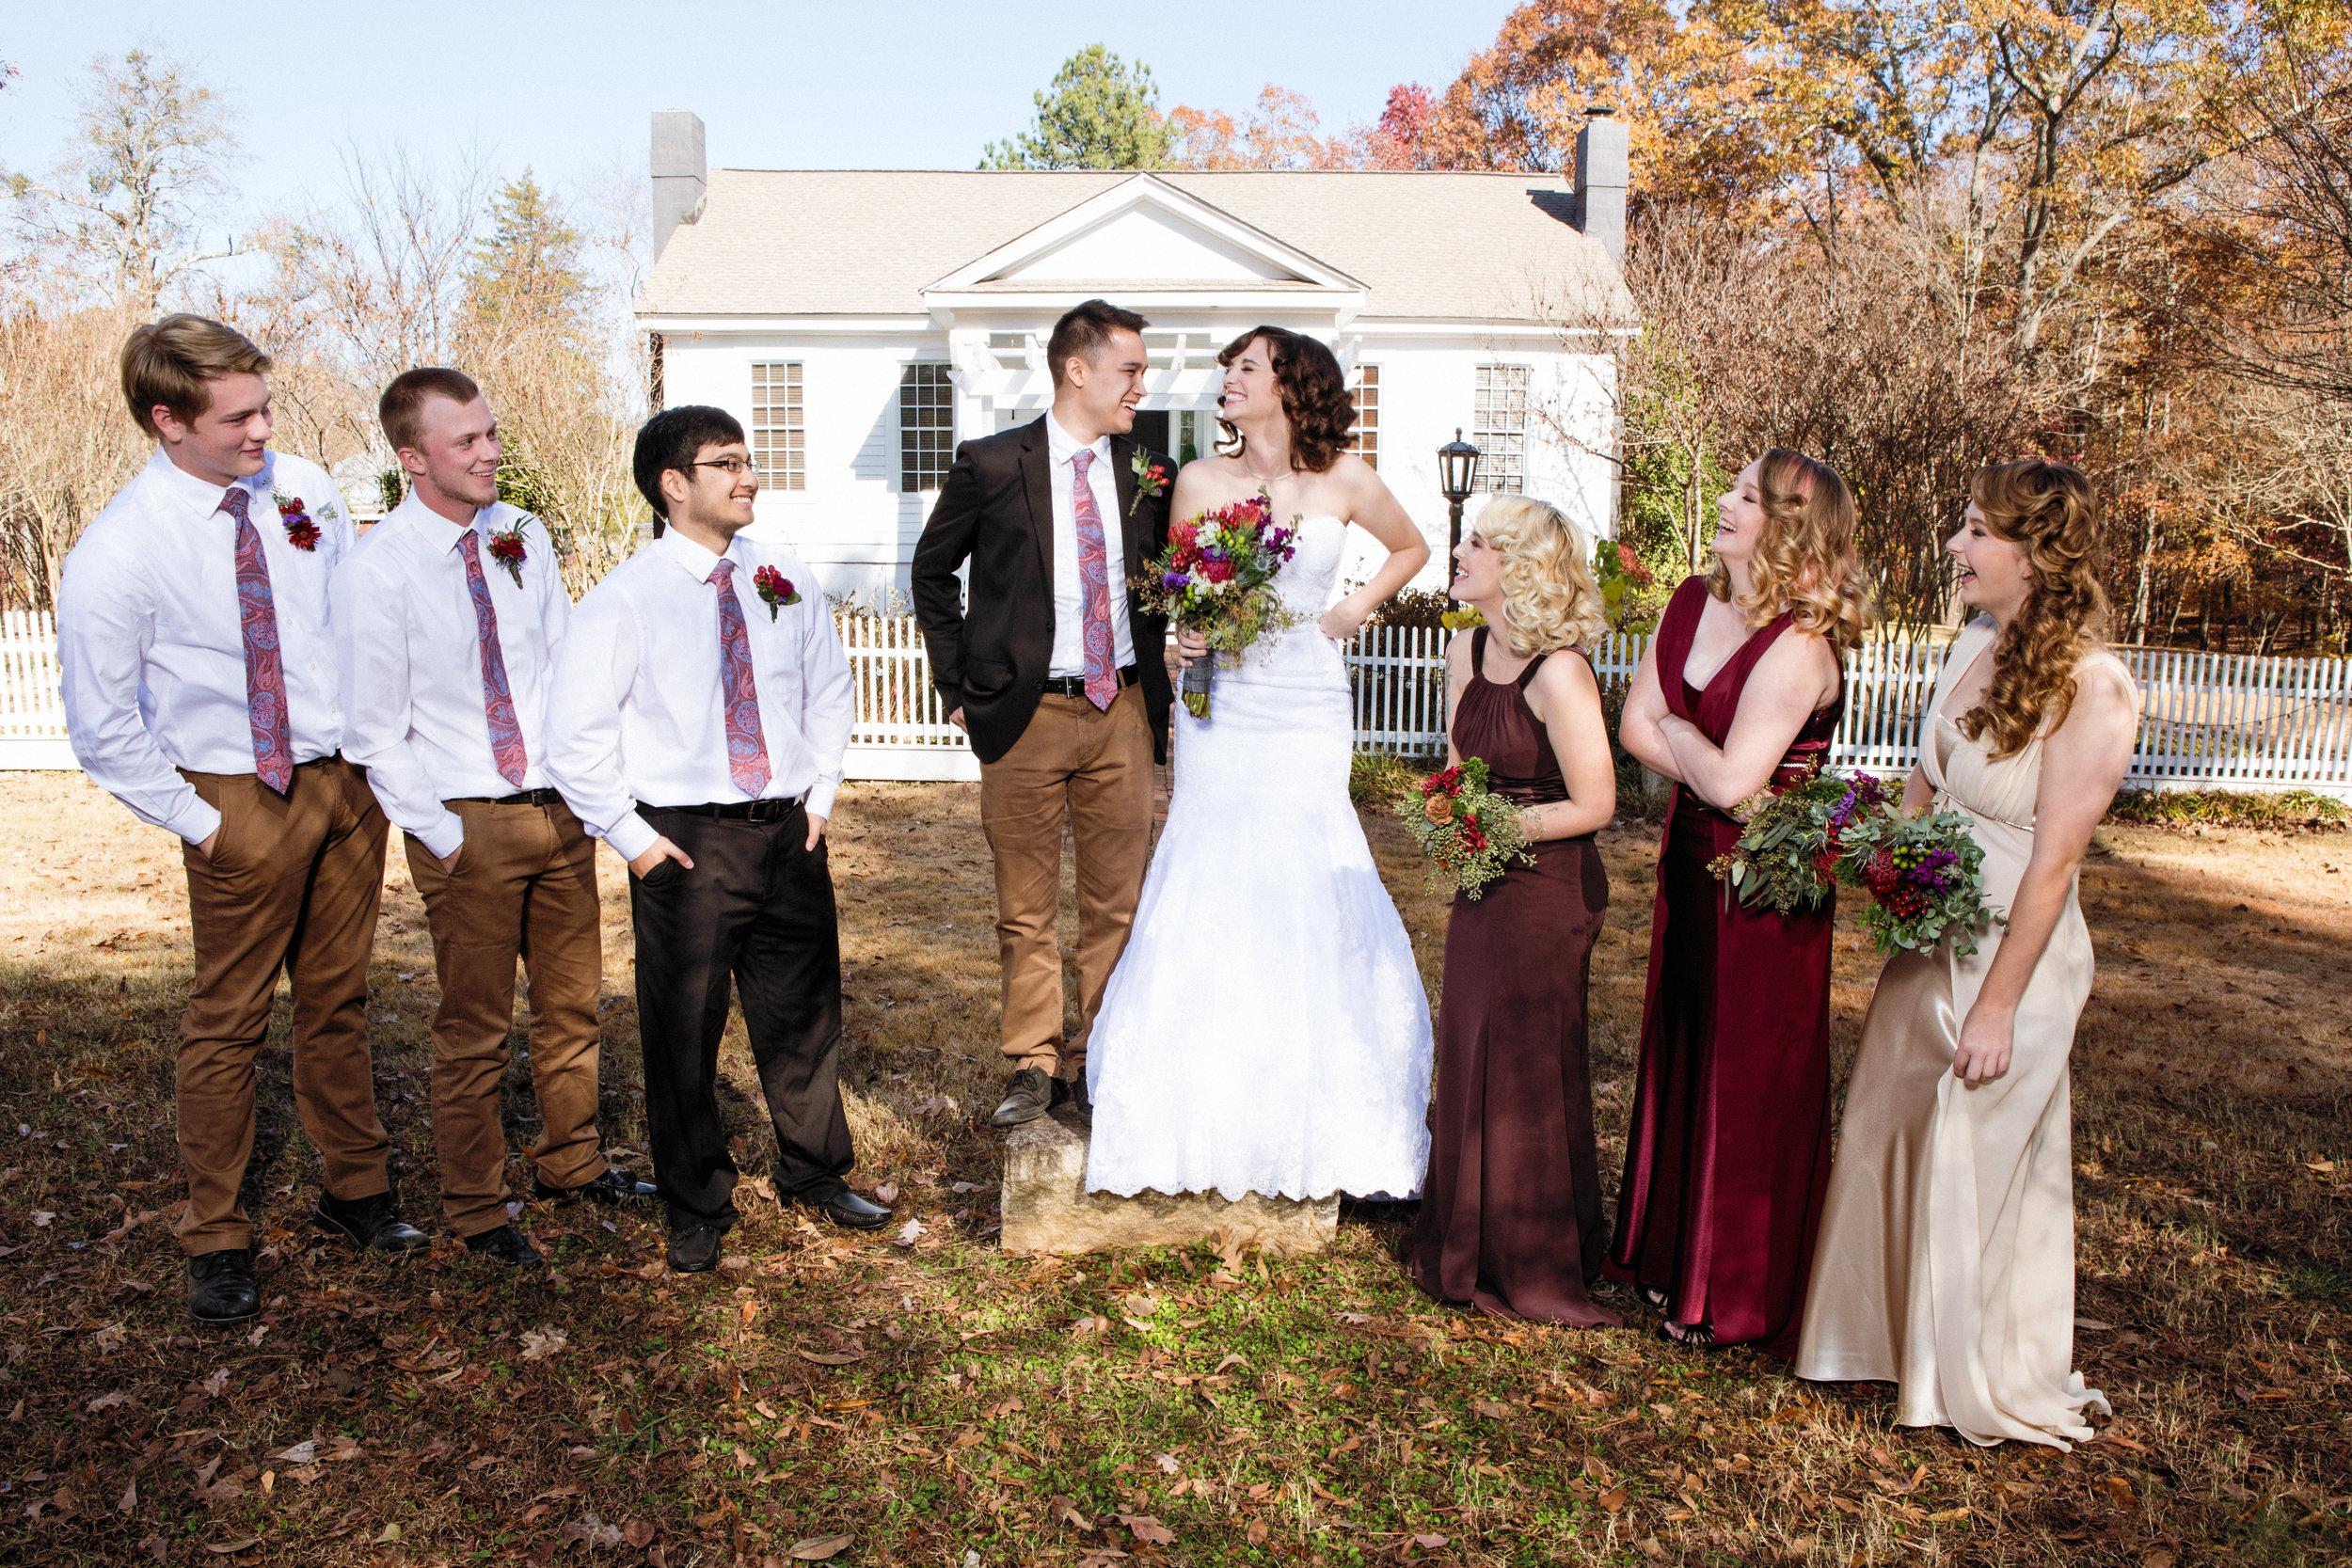 Pheauxtography_WeddingConcept-19.jpg